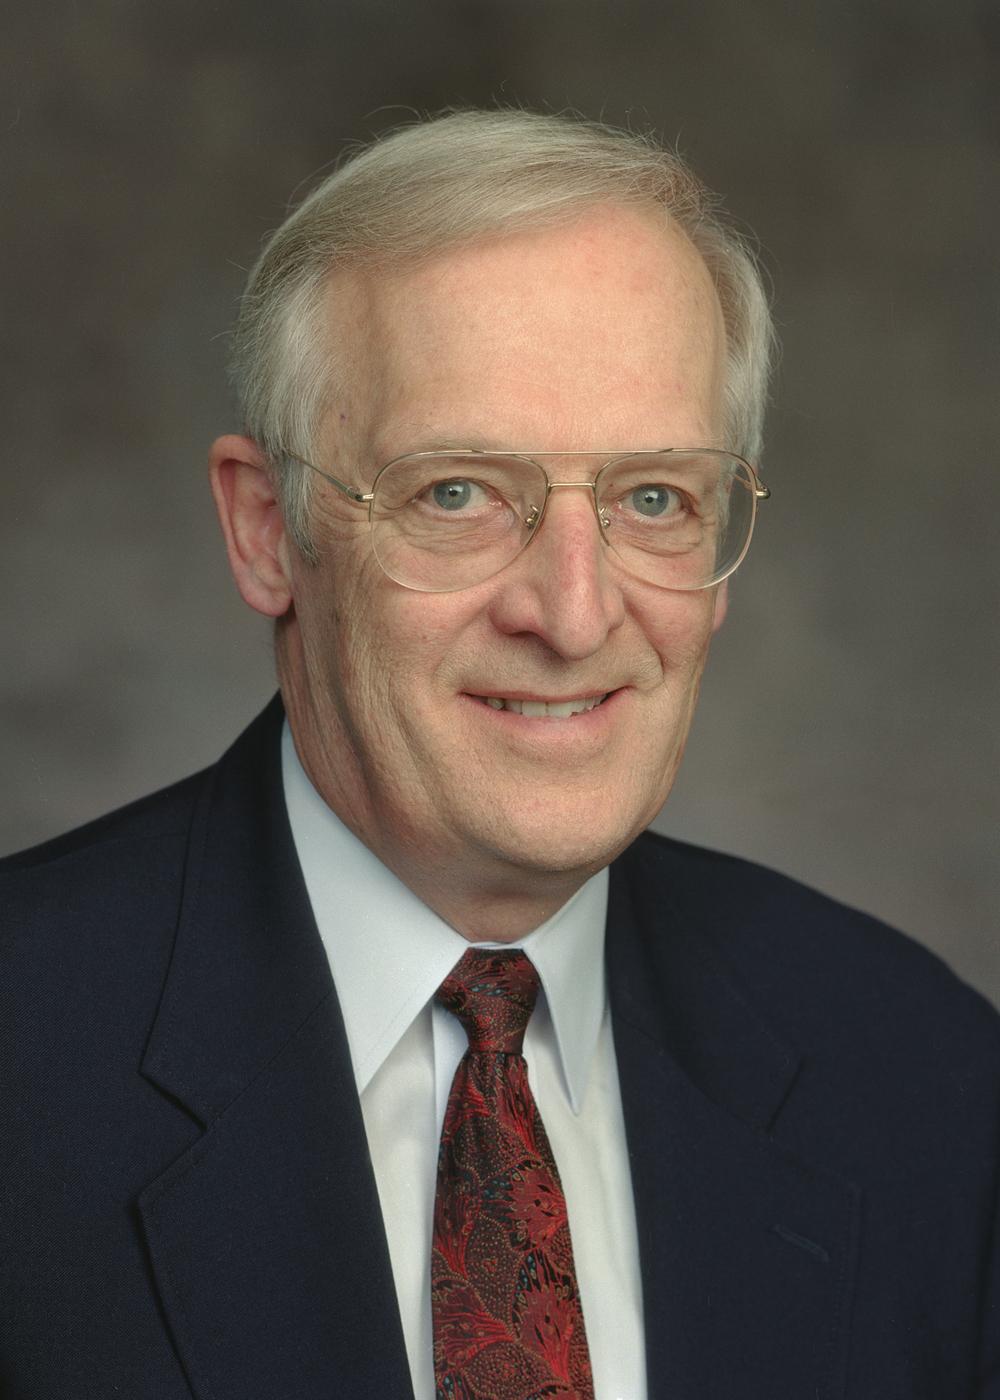 Professor Gene E. Likens headshot